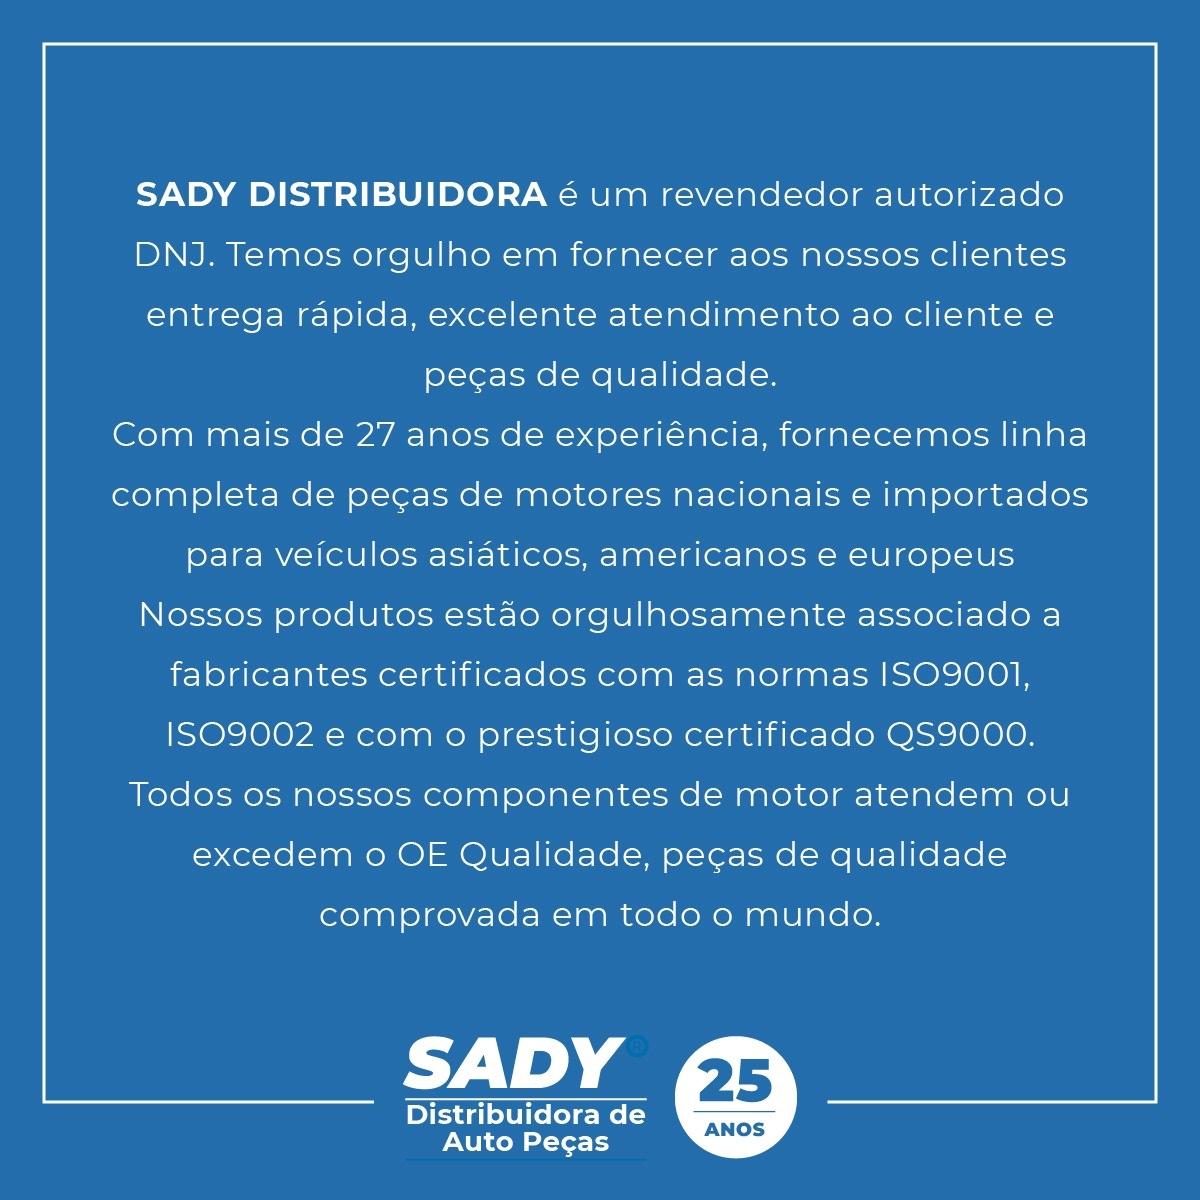 BOMBA DE OLEO DO MOTOR HONDA 1.4/1.5 FIT